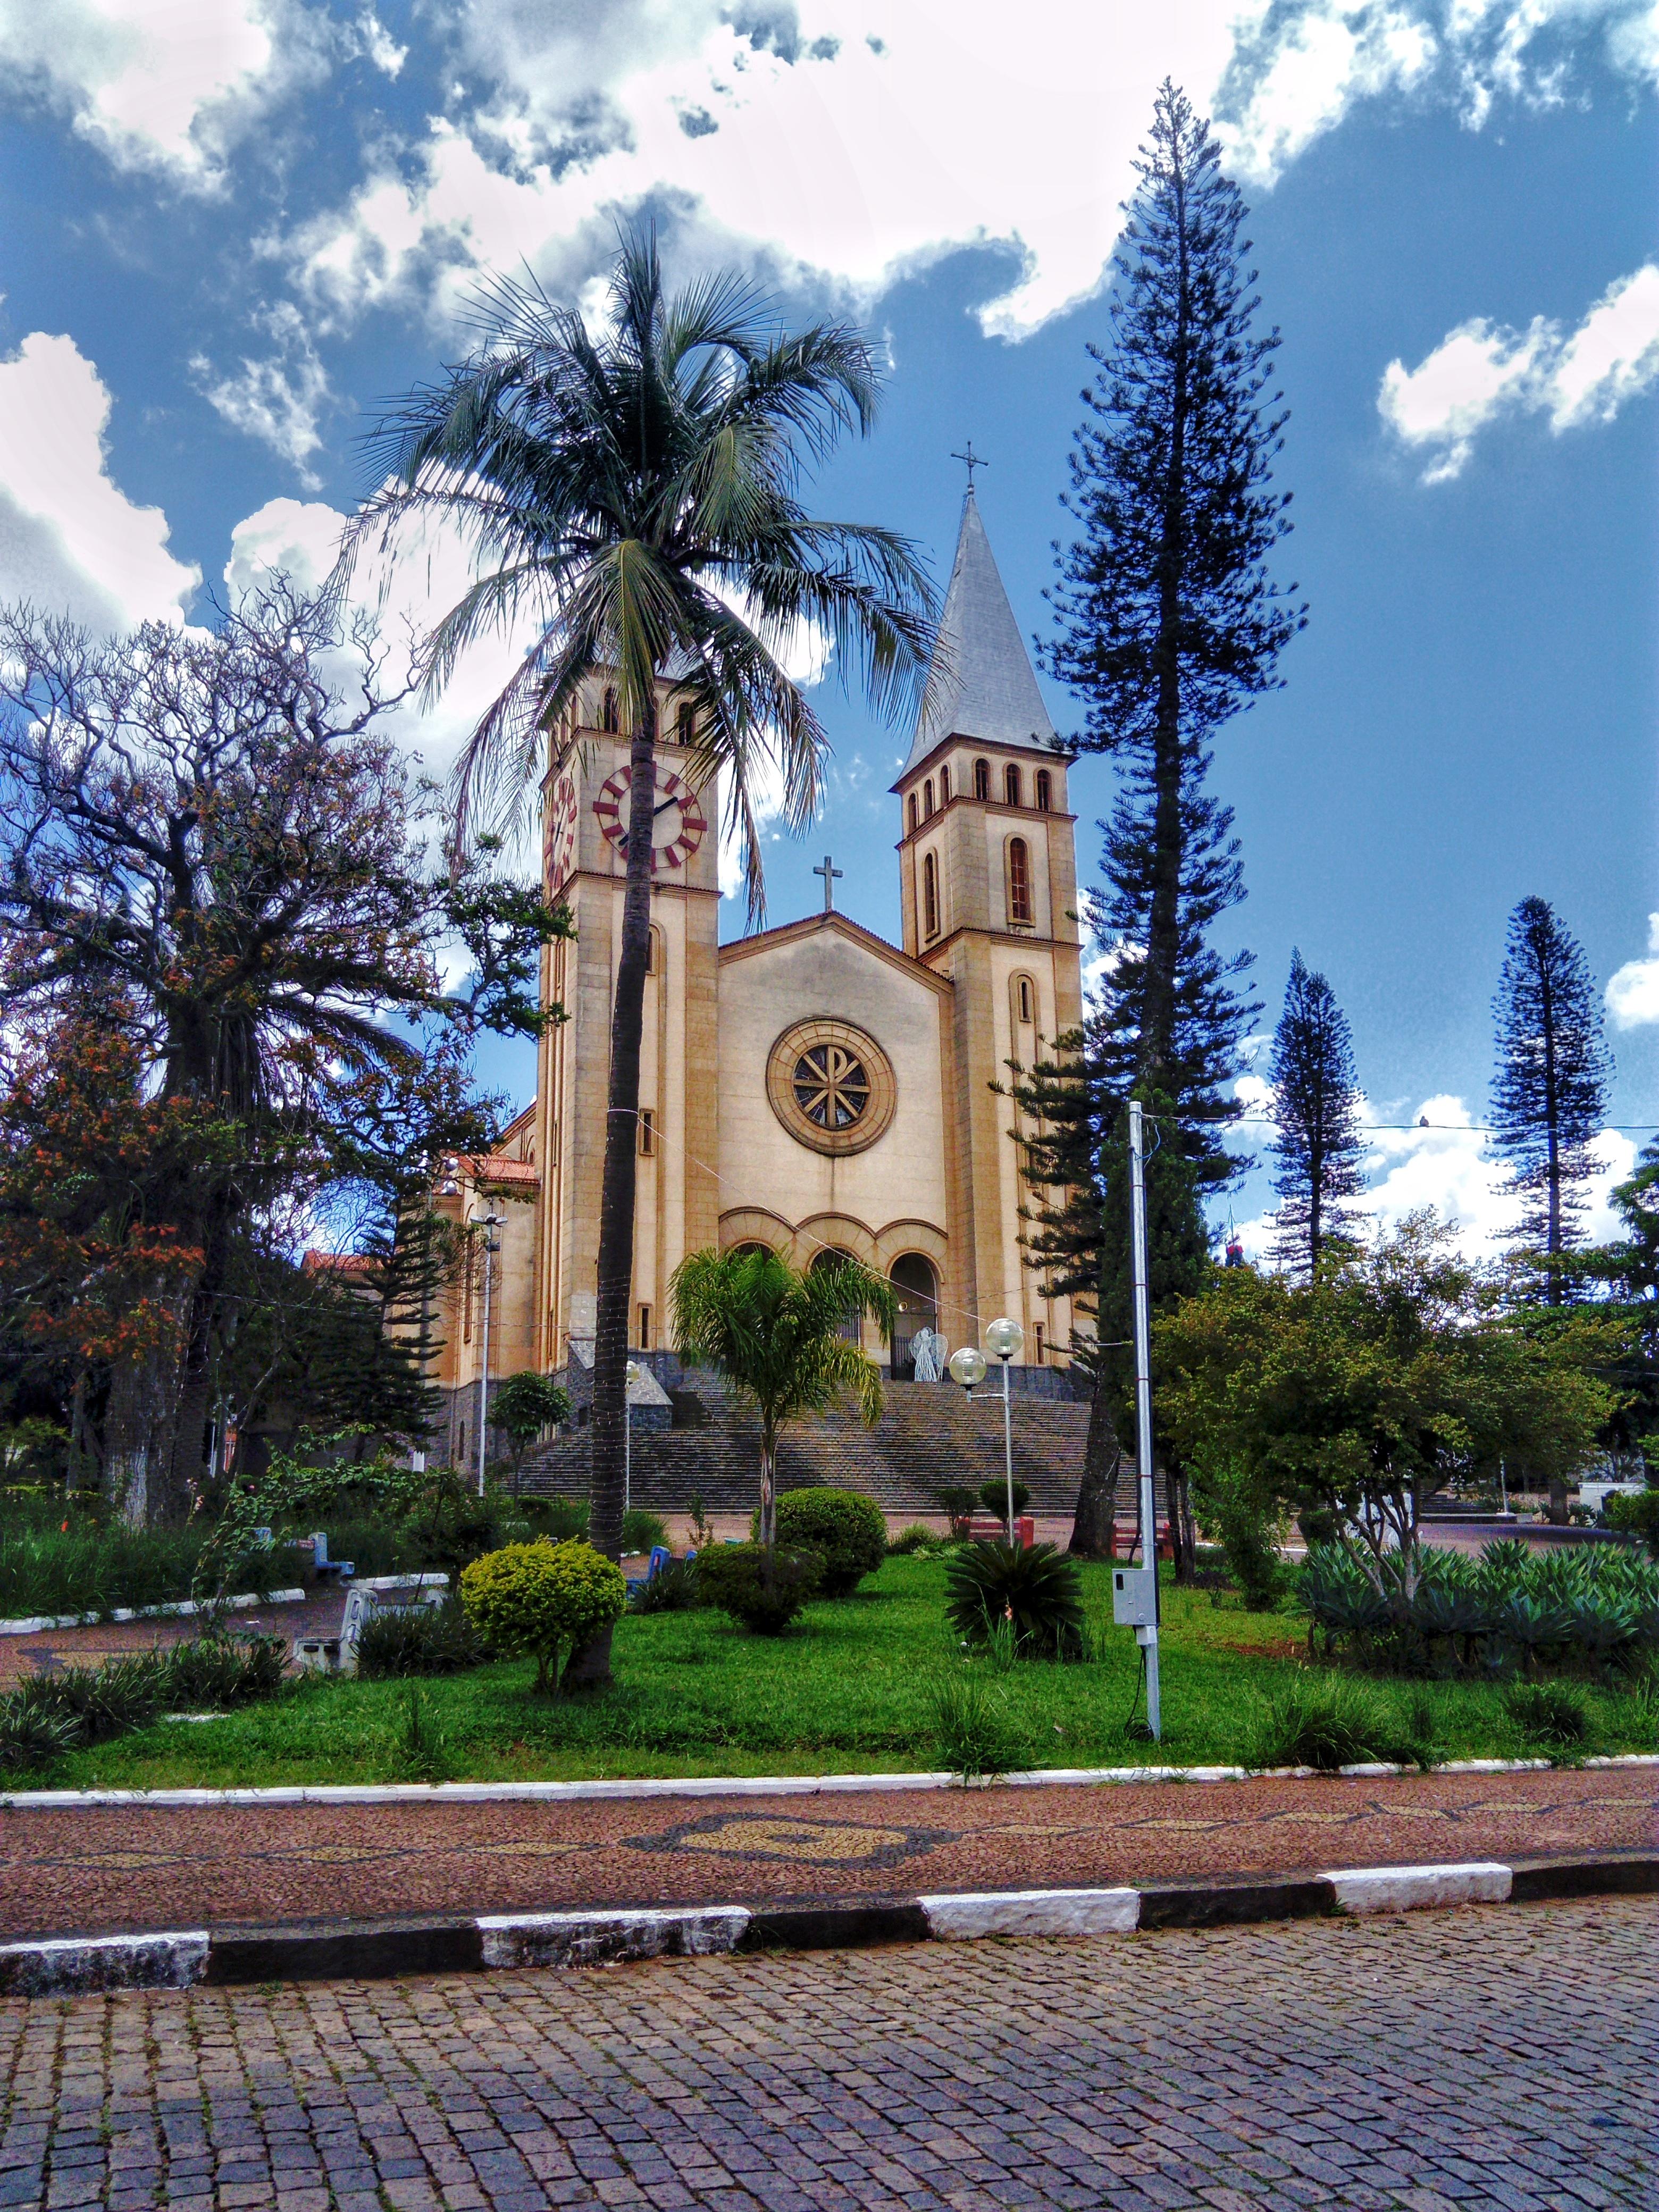 Guaxupé Minas Gerais fonte: upload.wikimedia.org